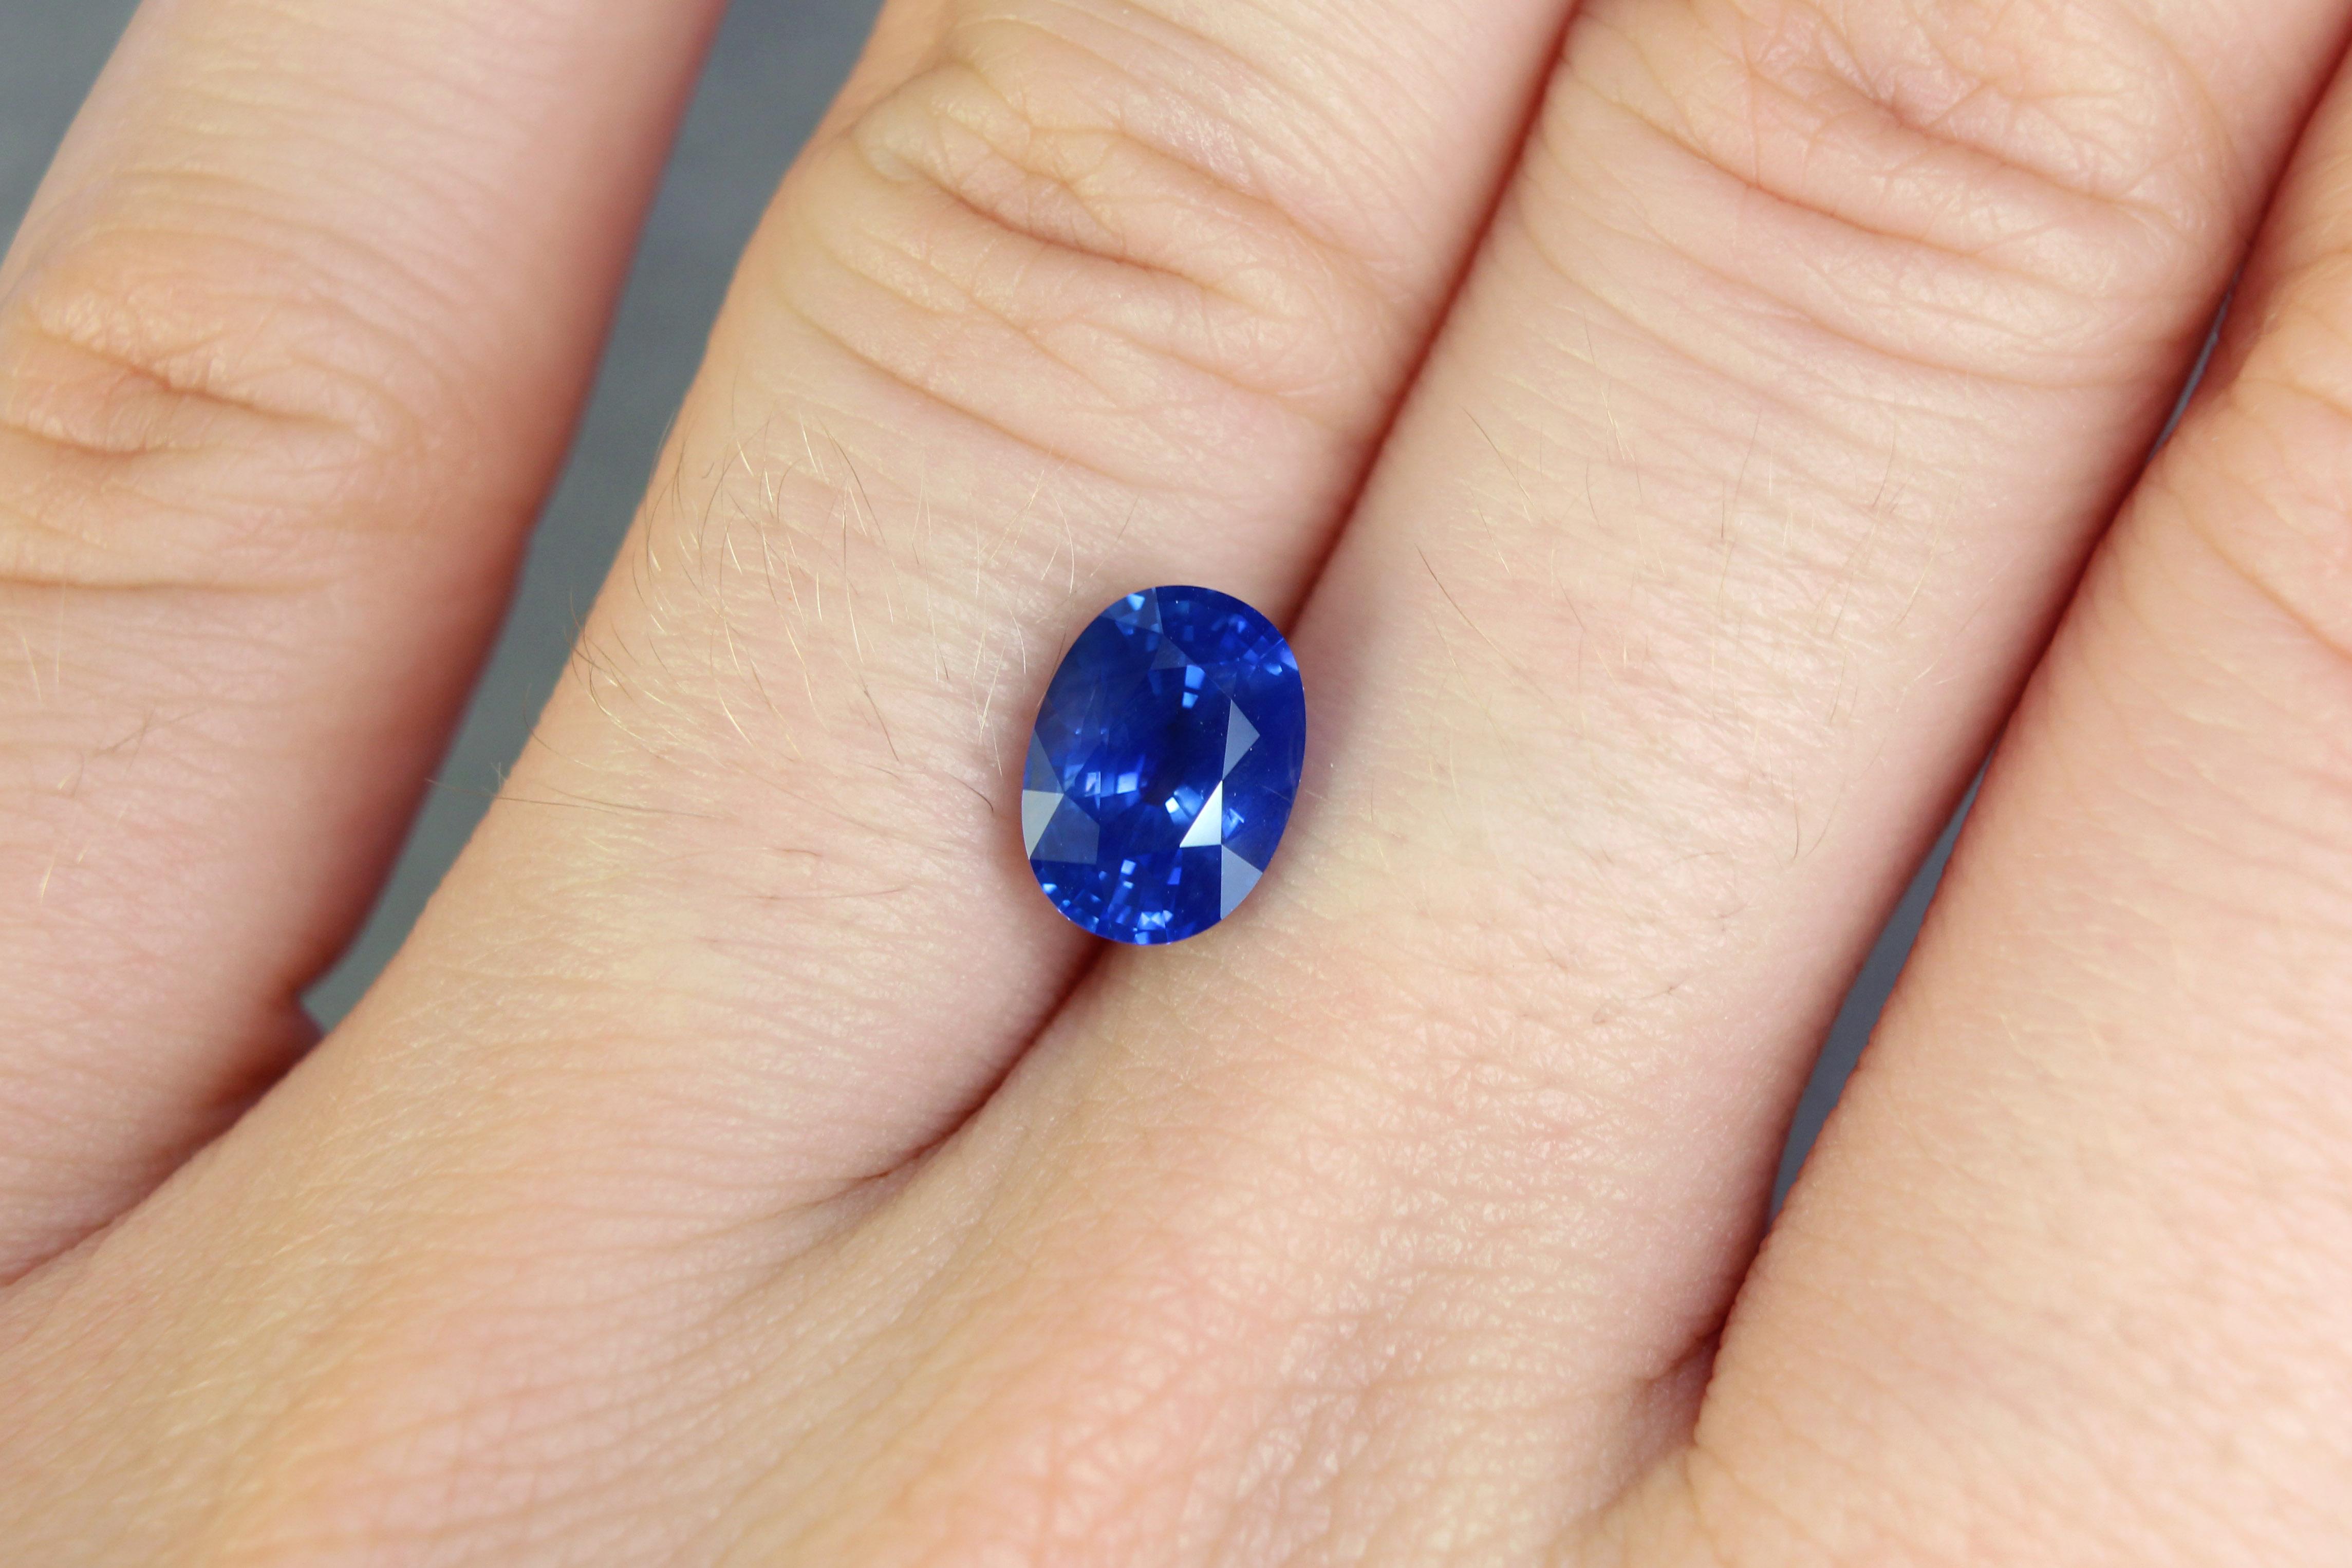 2.11 ct blue oval sapphire